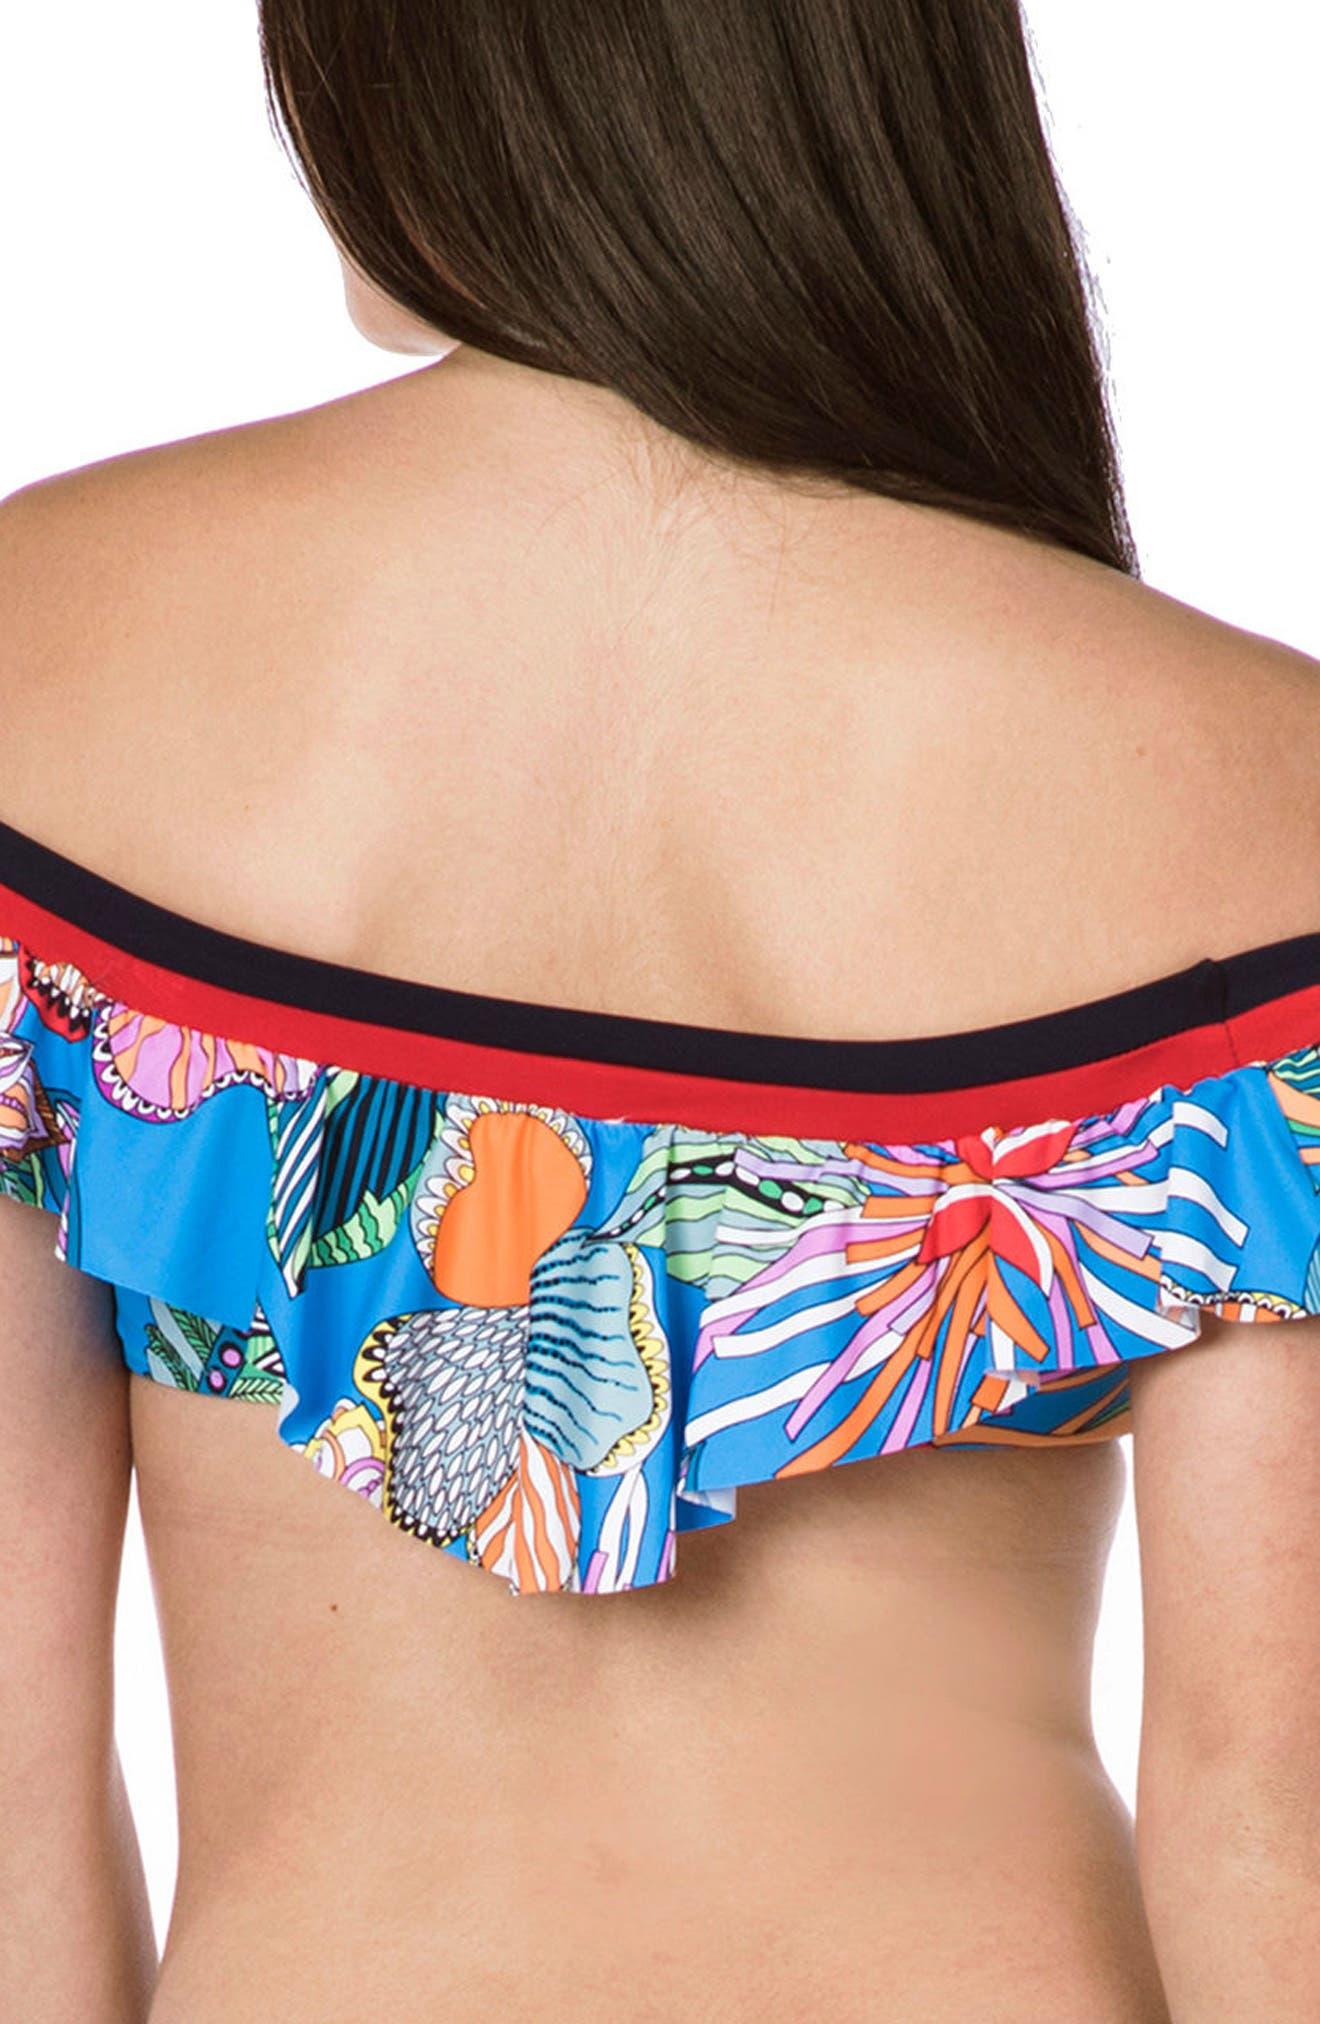 Tahiti Tropical Off the Shoulder Bikini Top,                             Alternate thumbnail 2, color,                             BLUE MULTI